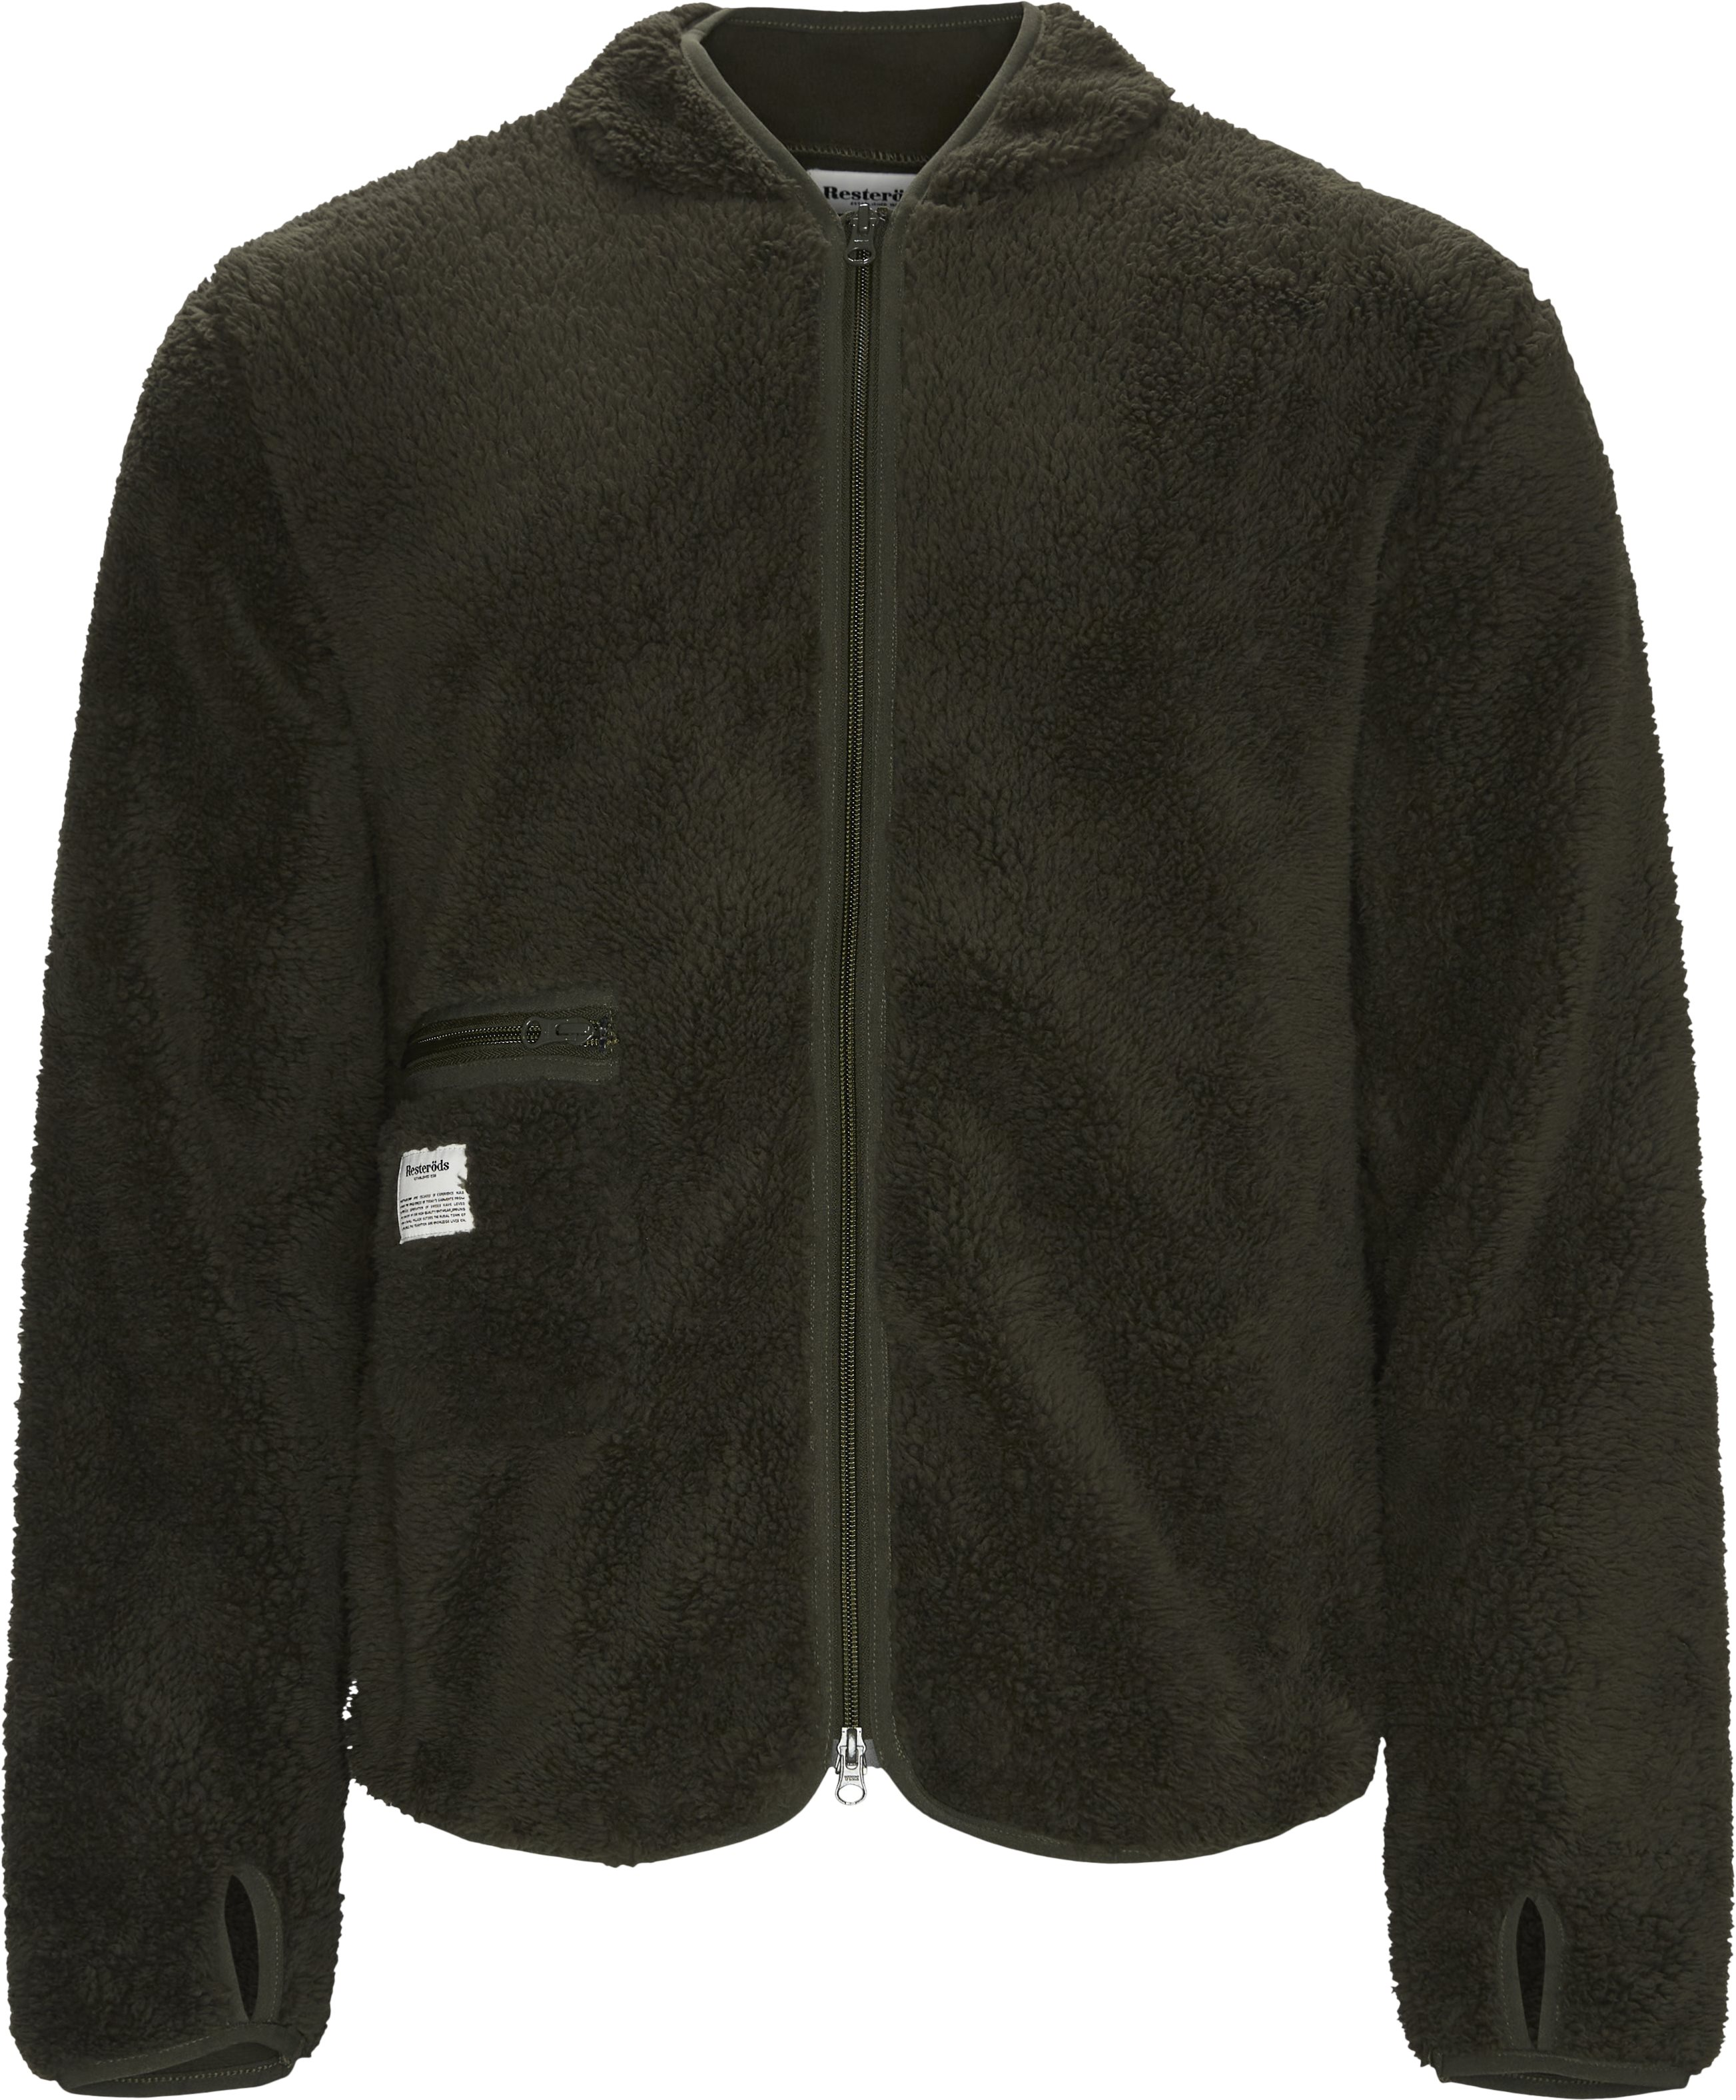 Fleece Jacket - Jackets - Regular - Army